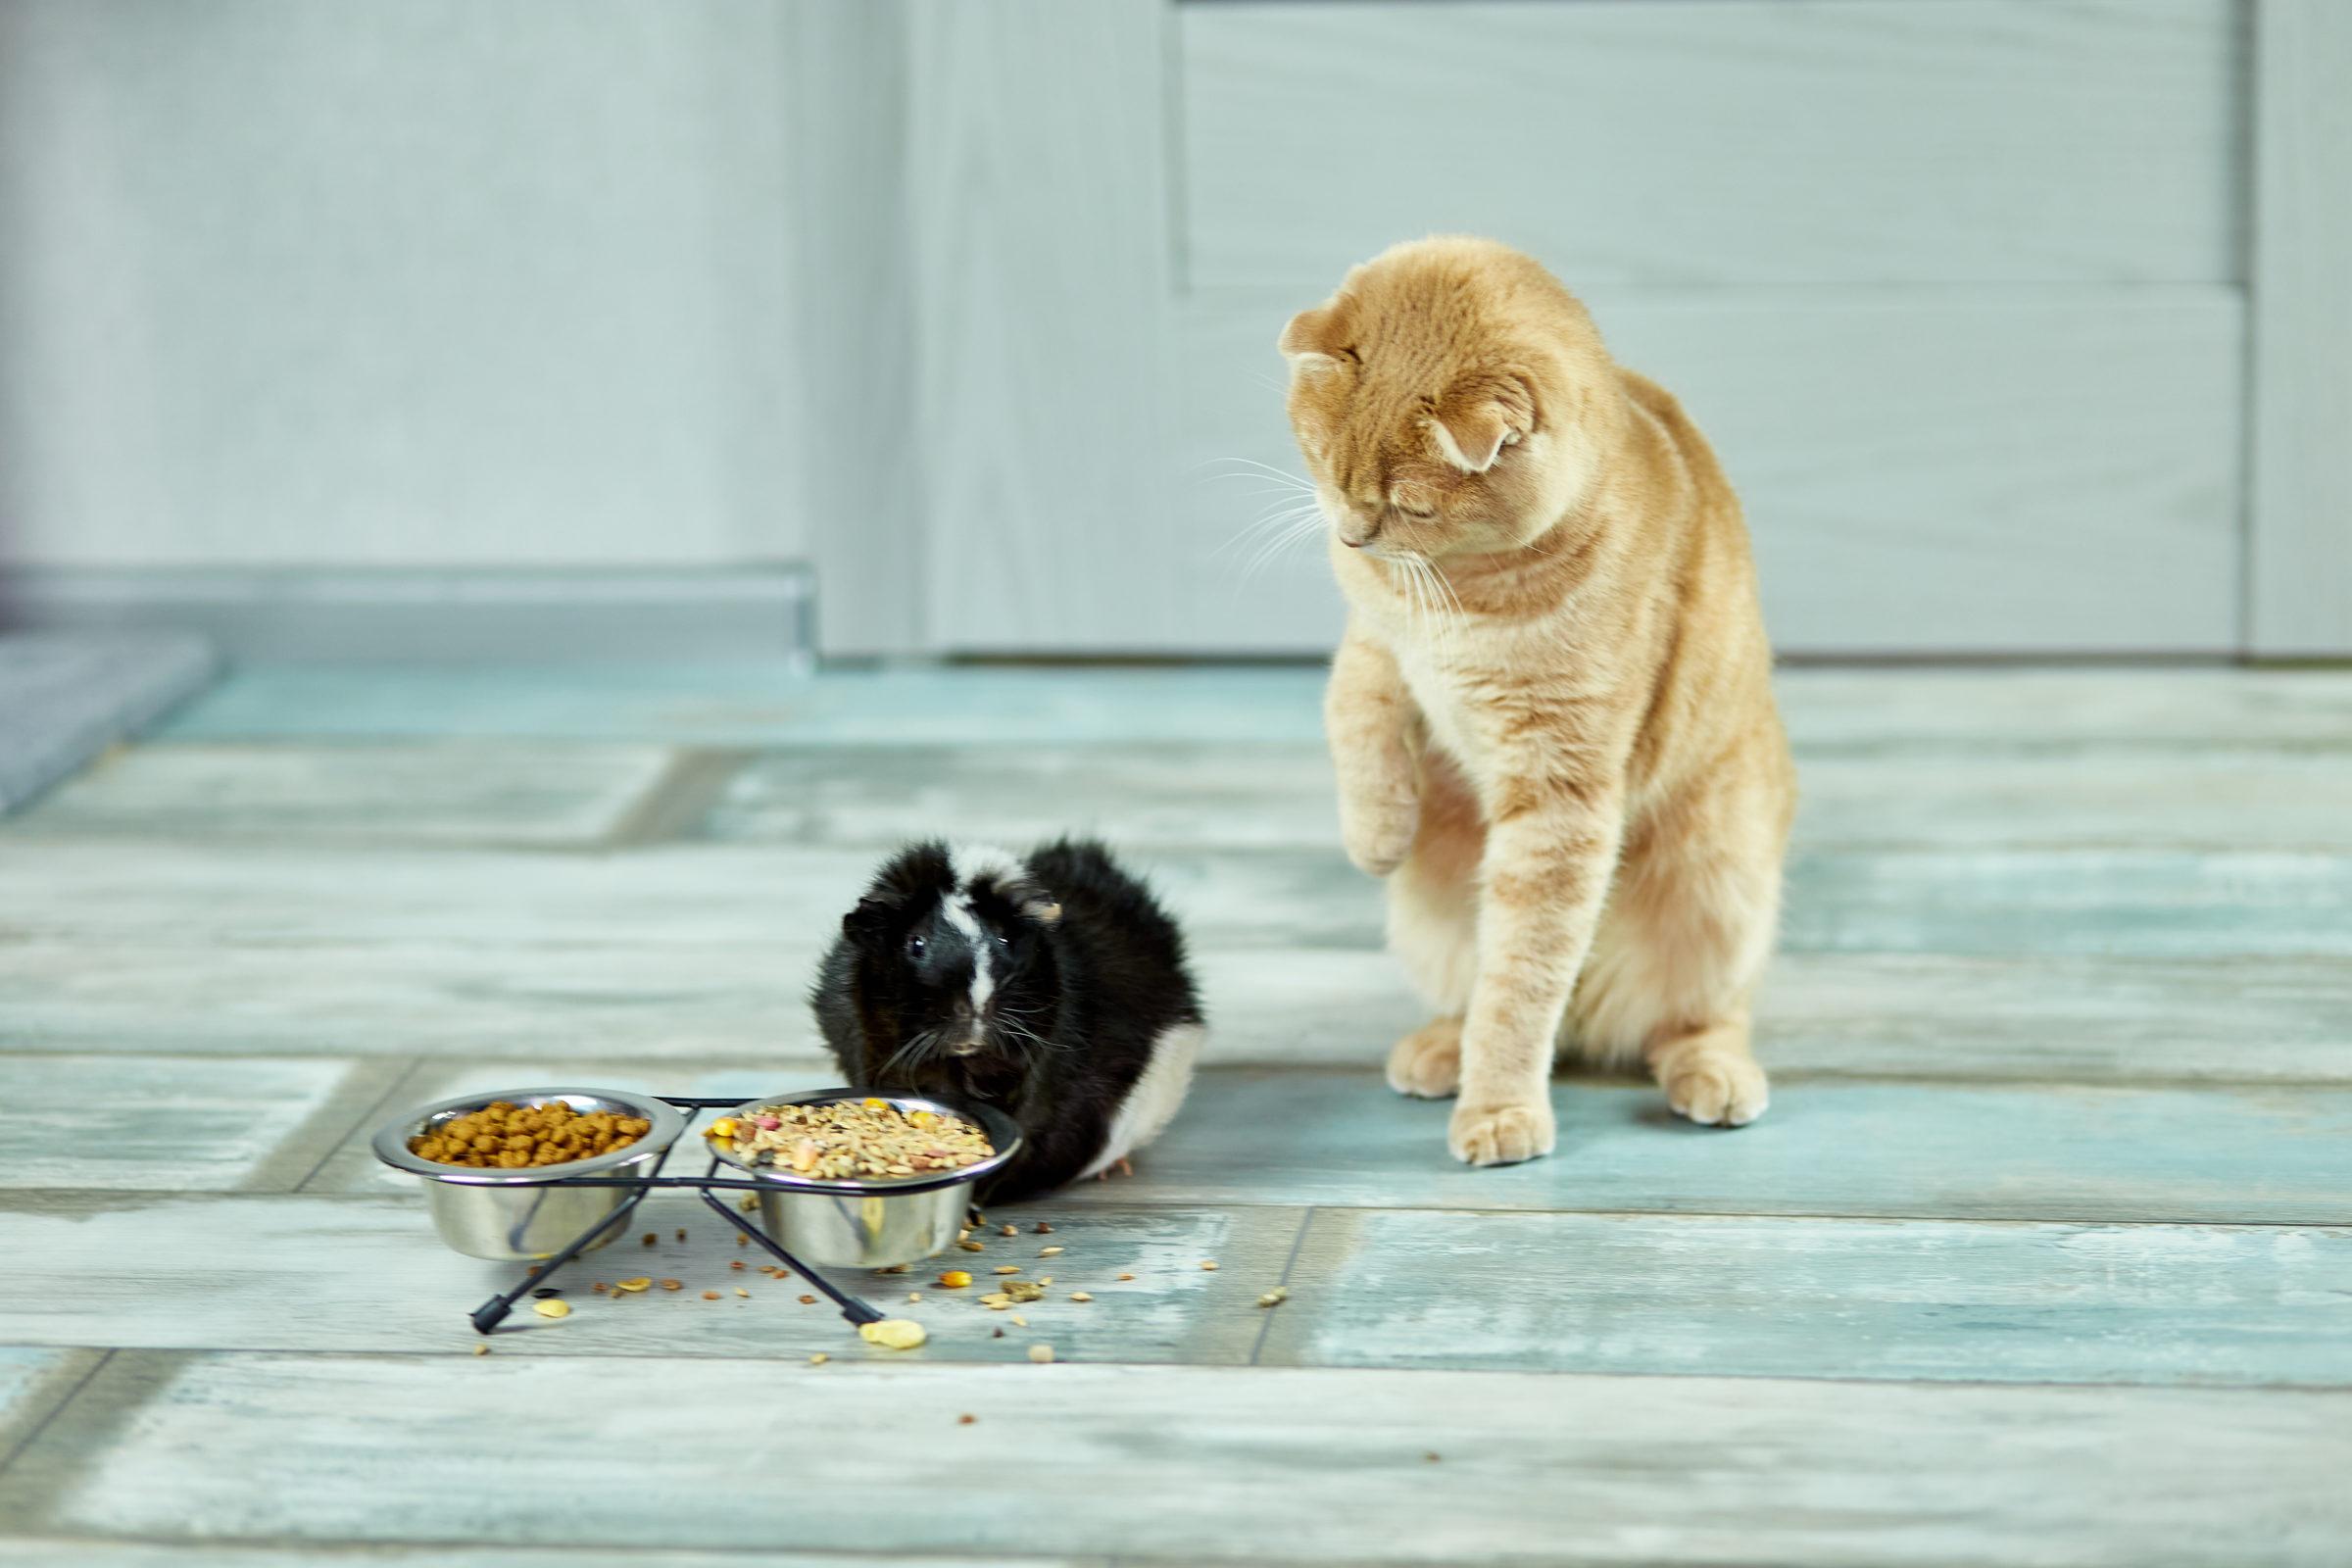 the cat look at a guinea pig domestic pet feeding 2021 04 06 19 41 21 utc